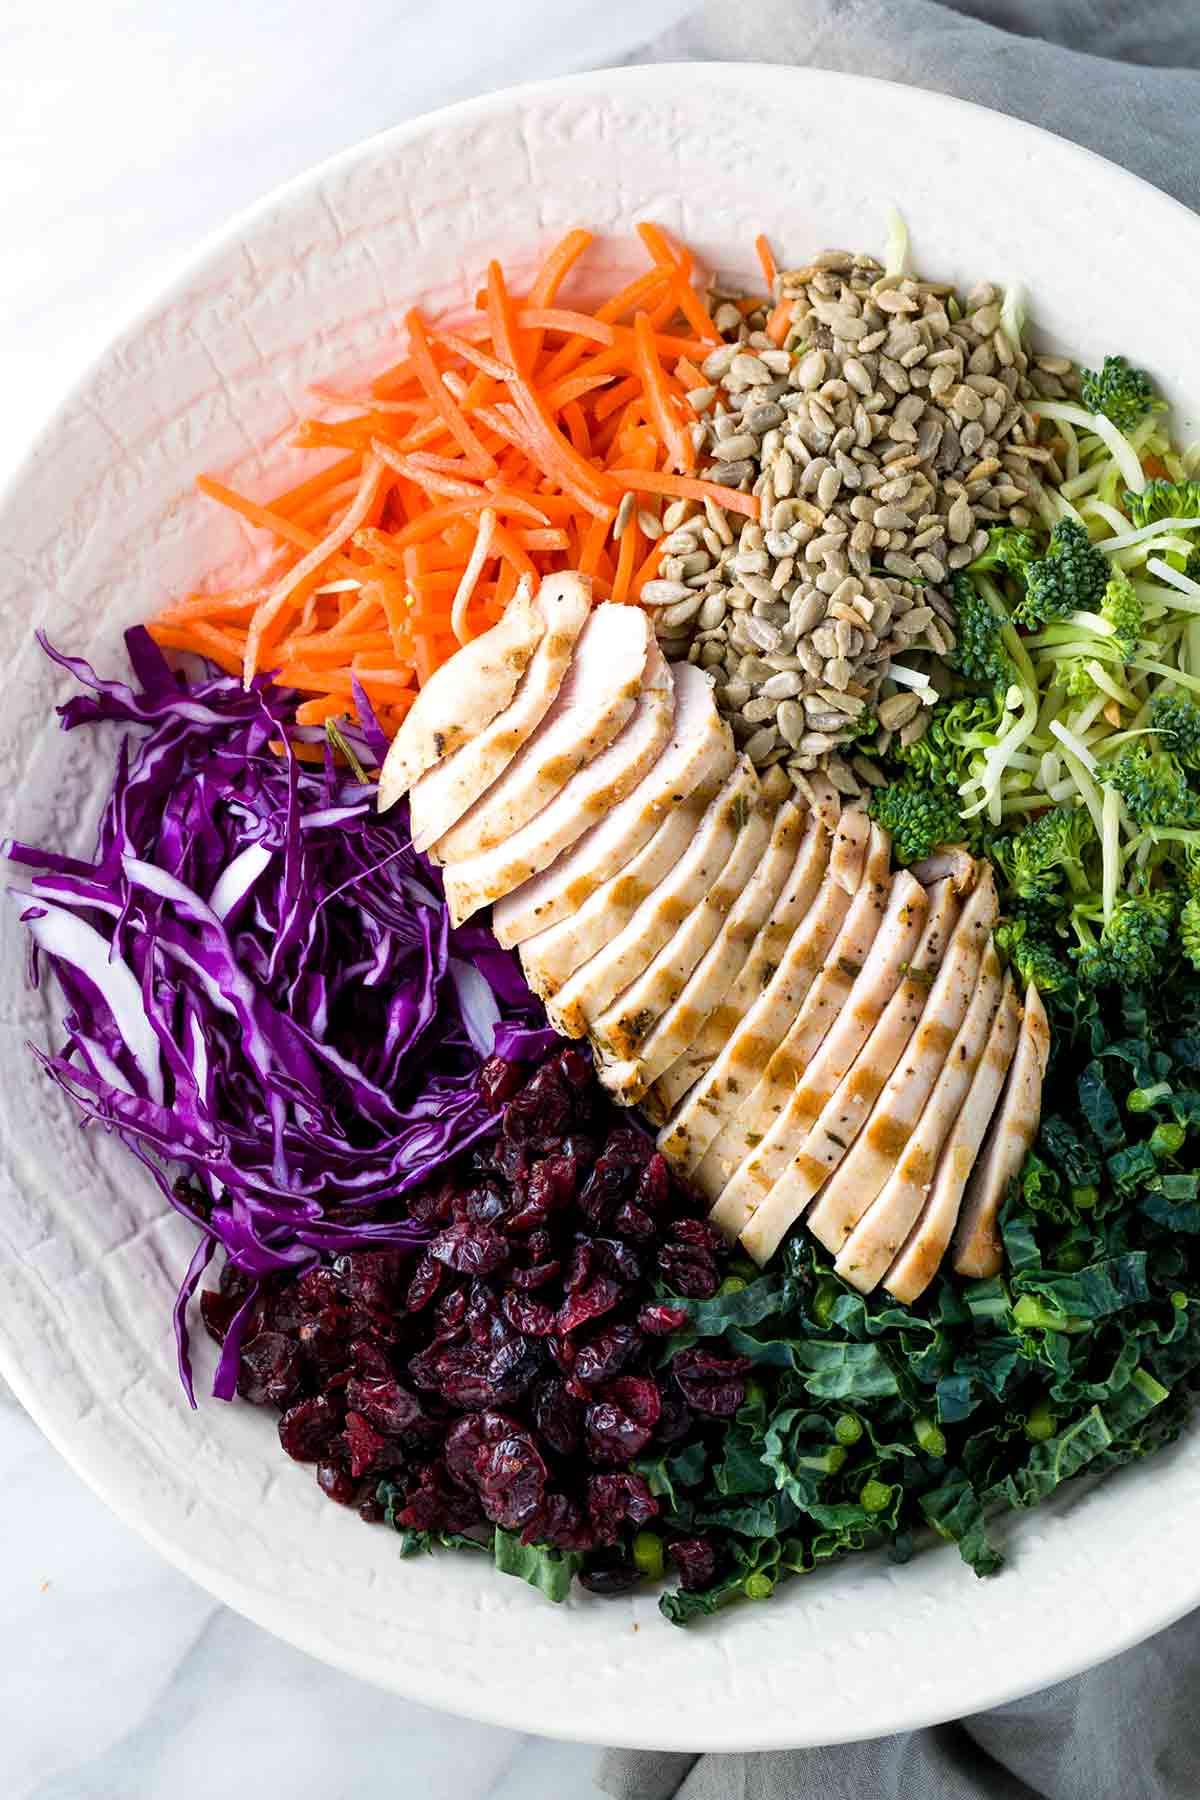 Ingredients for a delicious broccoli slaw salad